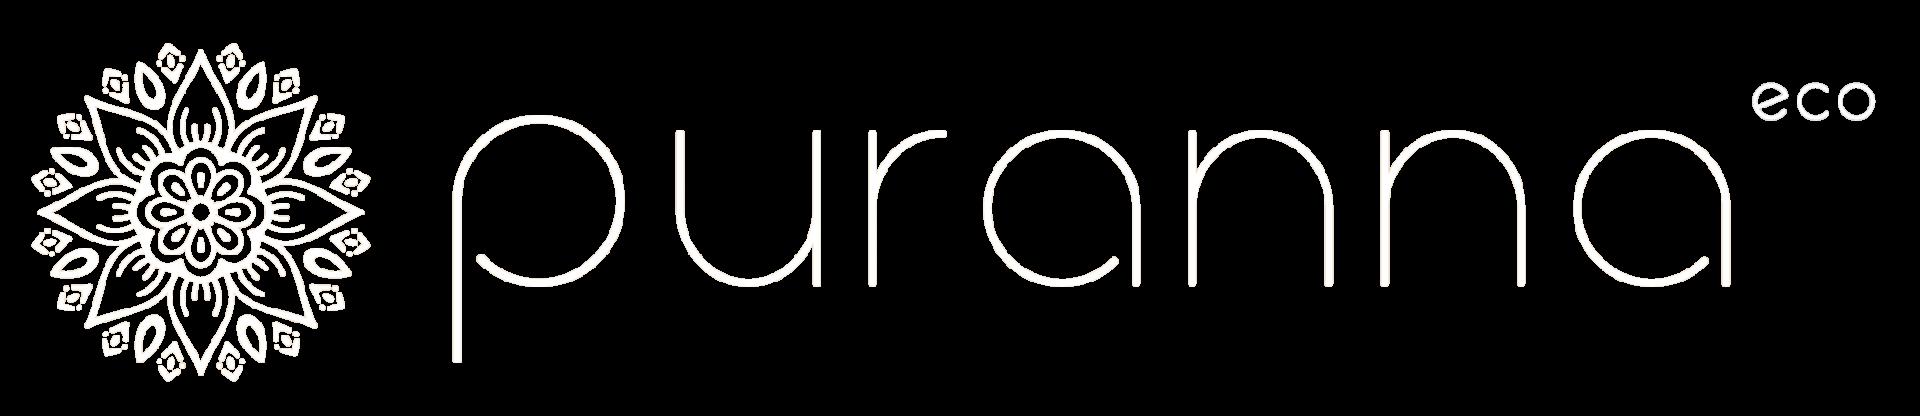 Puranna ECO